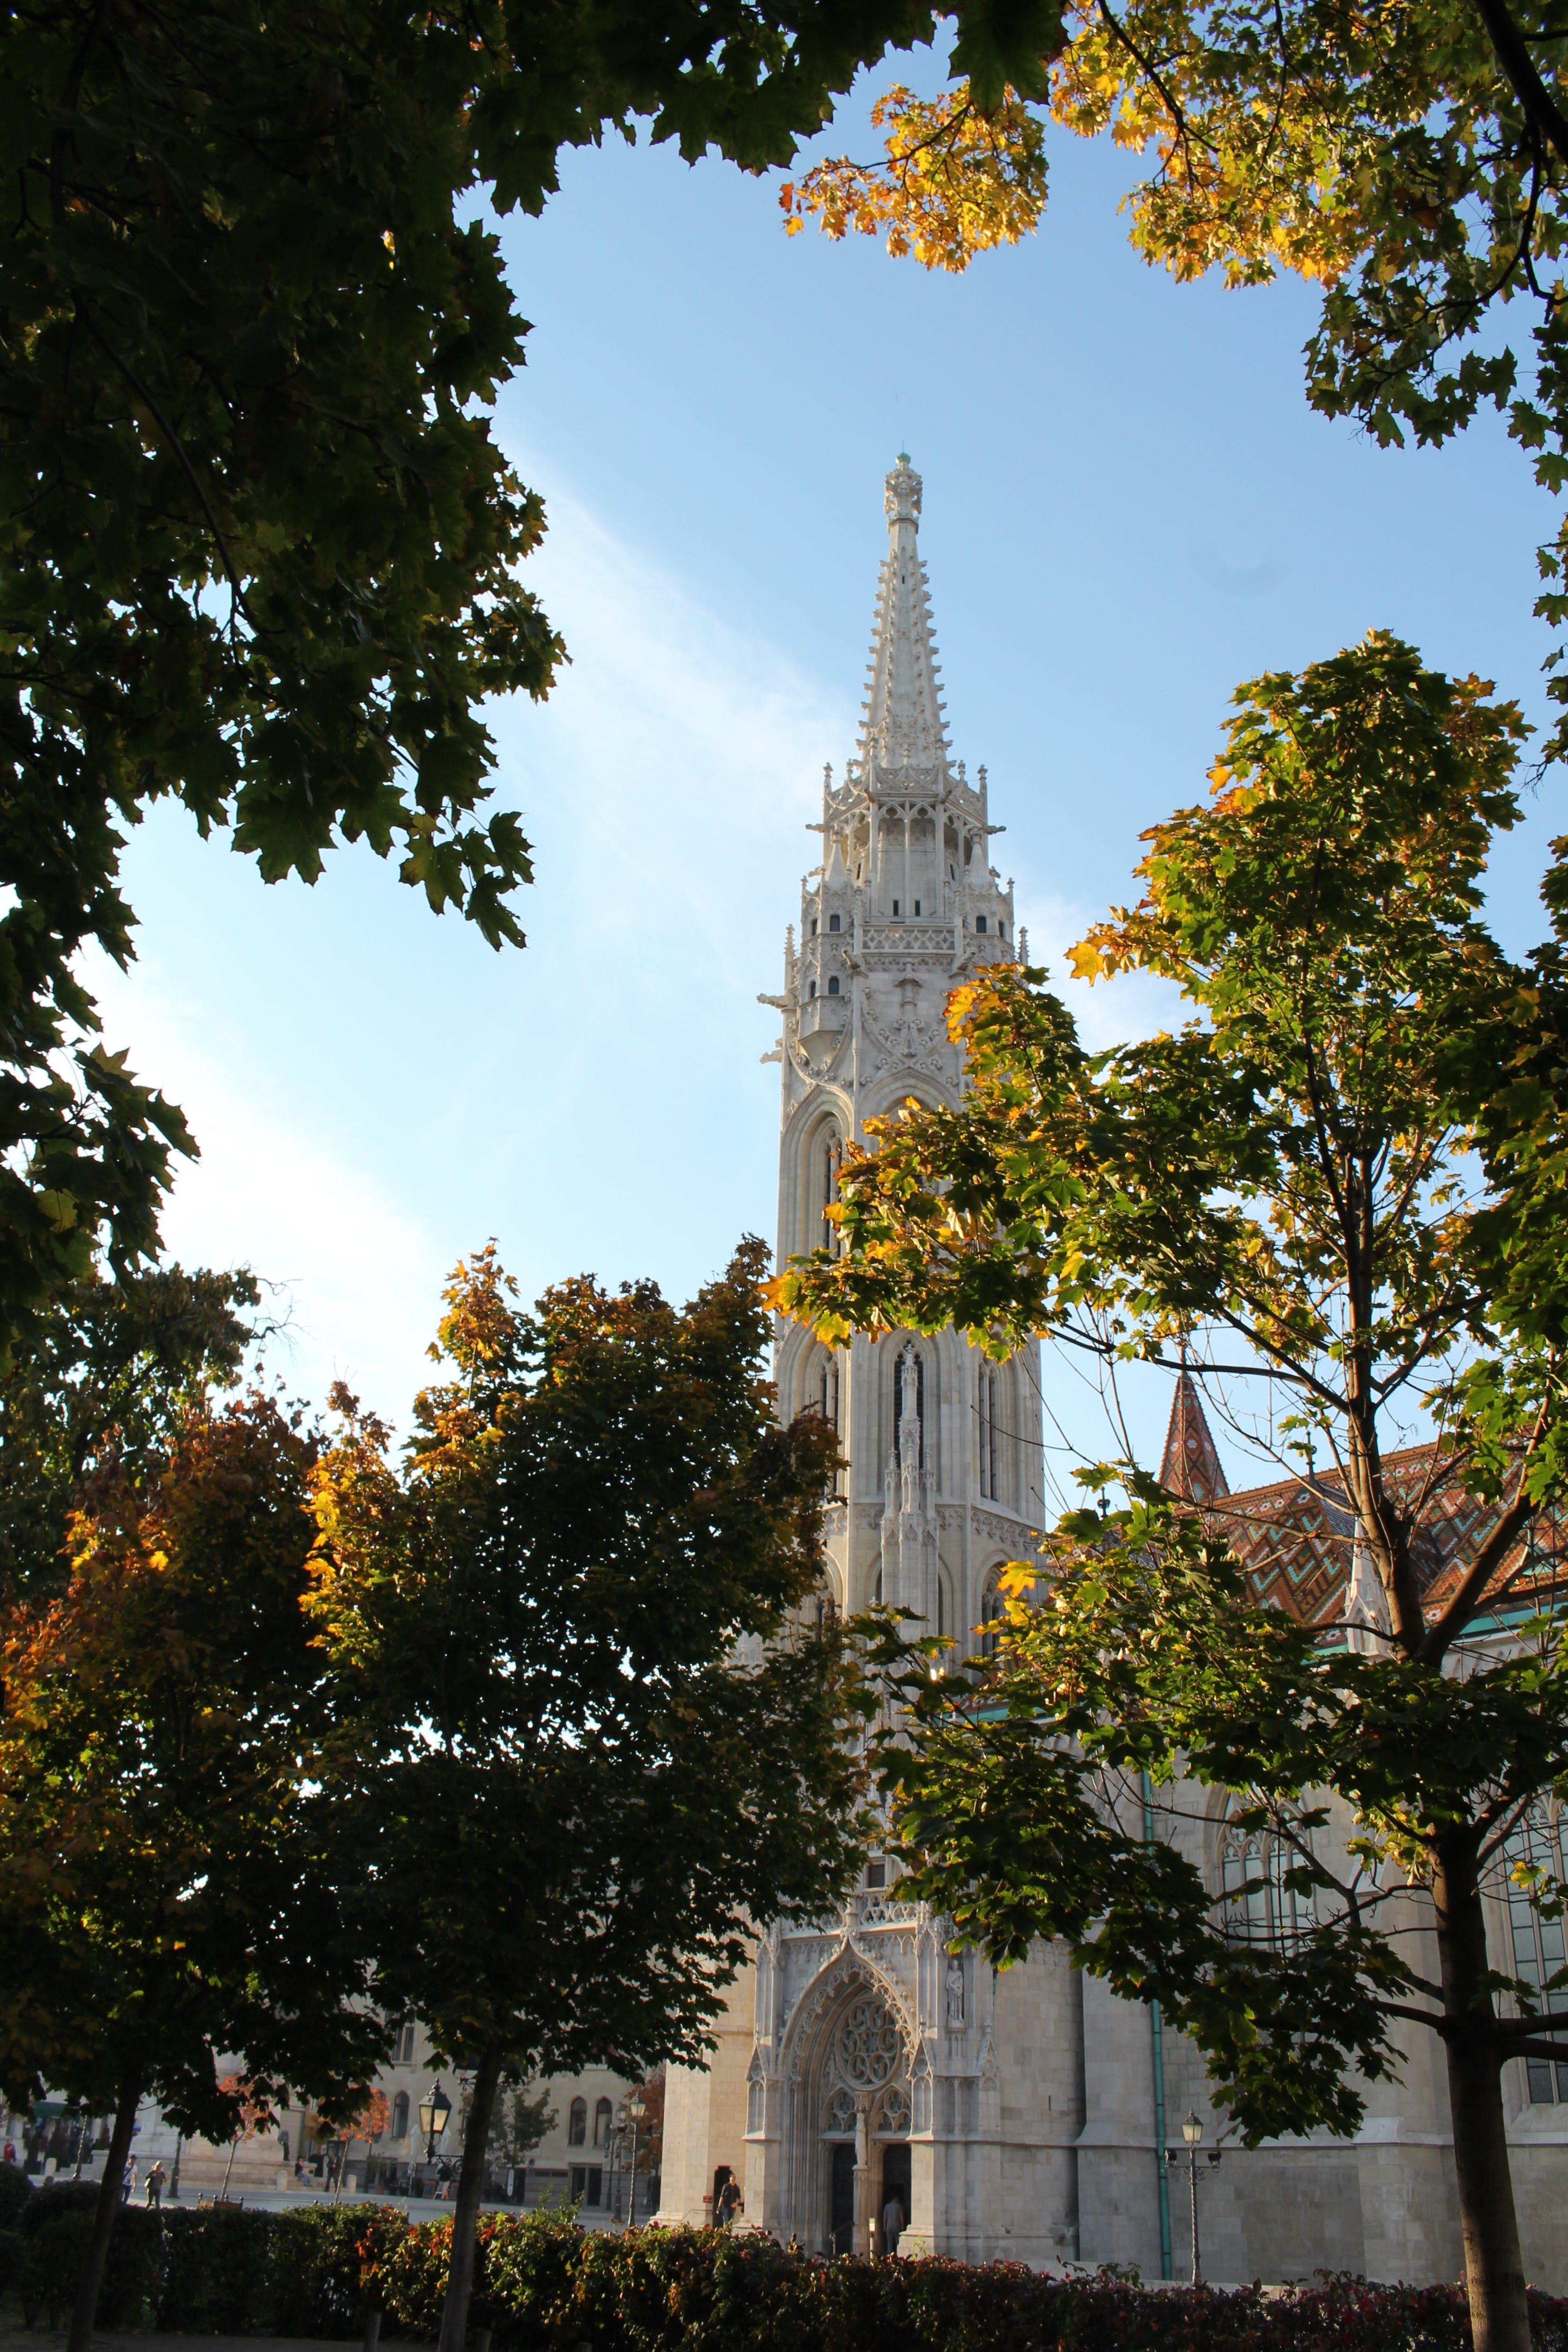 Kostenloses Stock Foto zu bäume, budapest, kirche, kirchengebäude